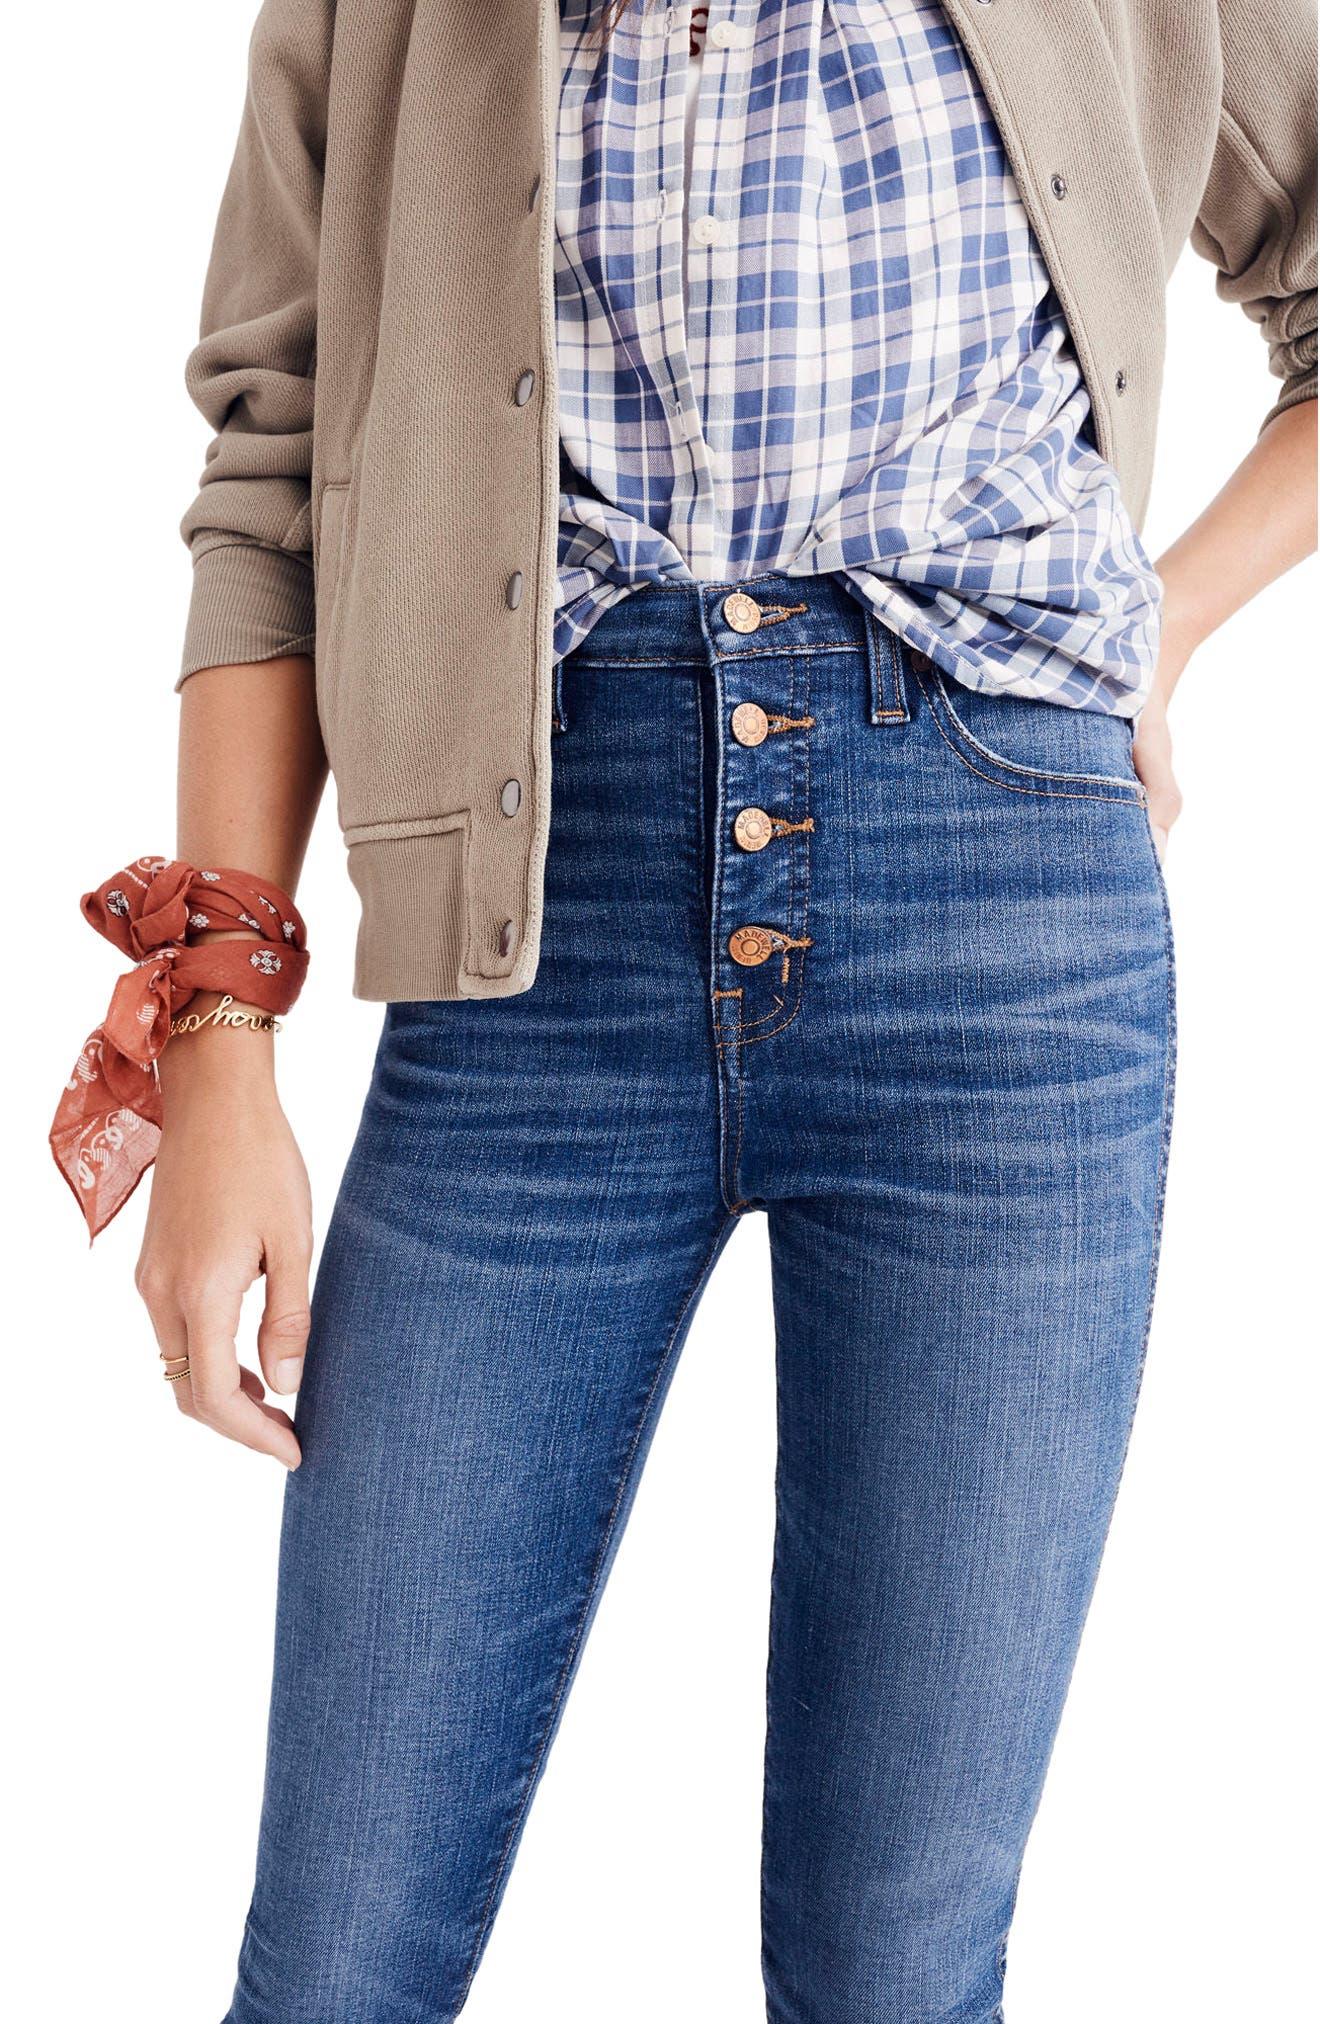 10-Inch Chewed Hem Skinny Jeans,                             Alternate thumbnail 2, color,                             Copeland